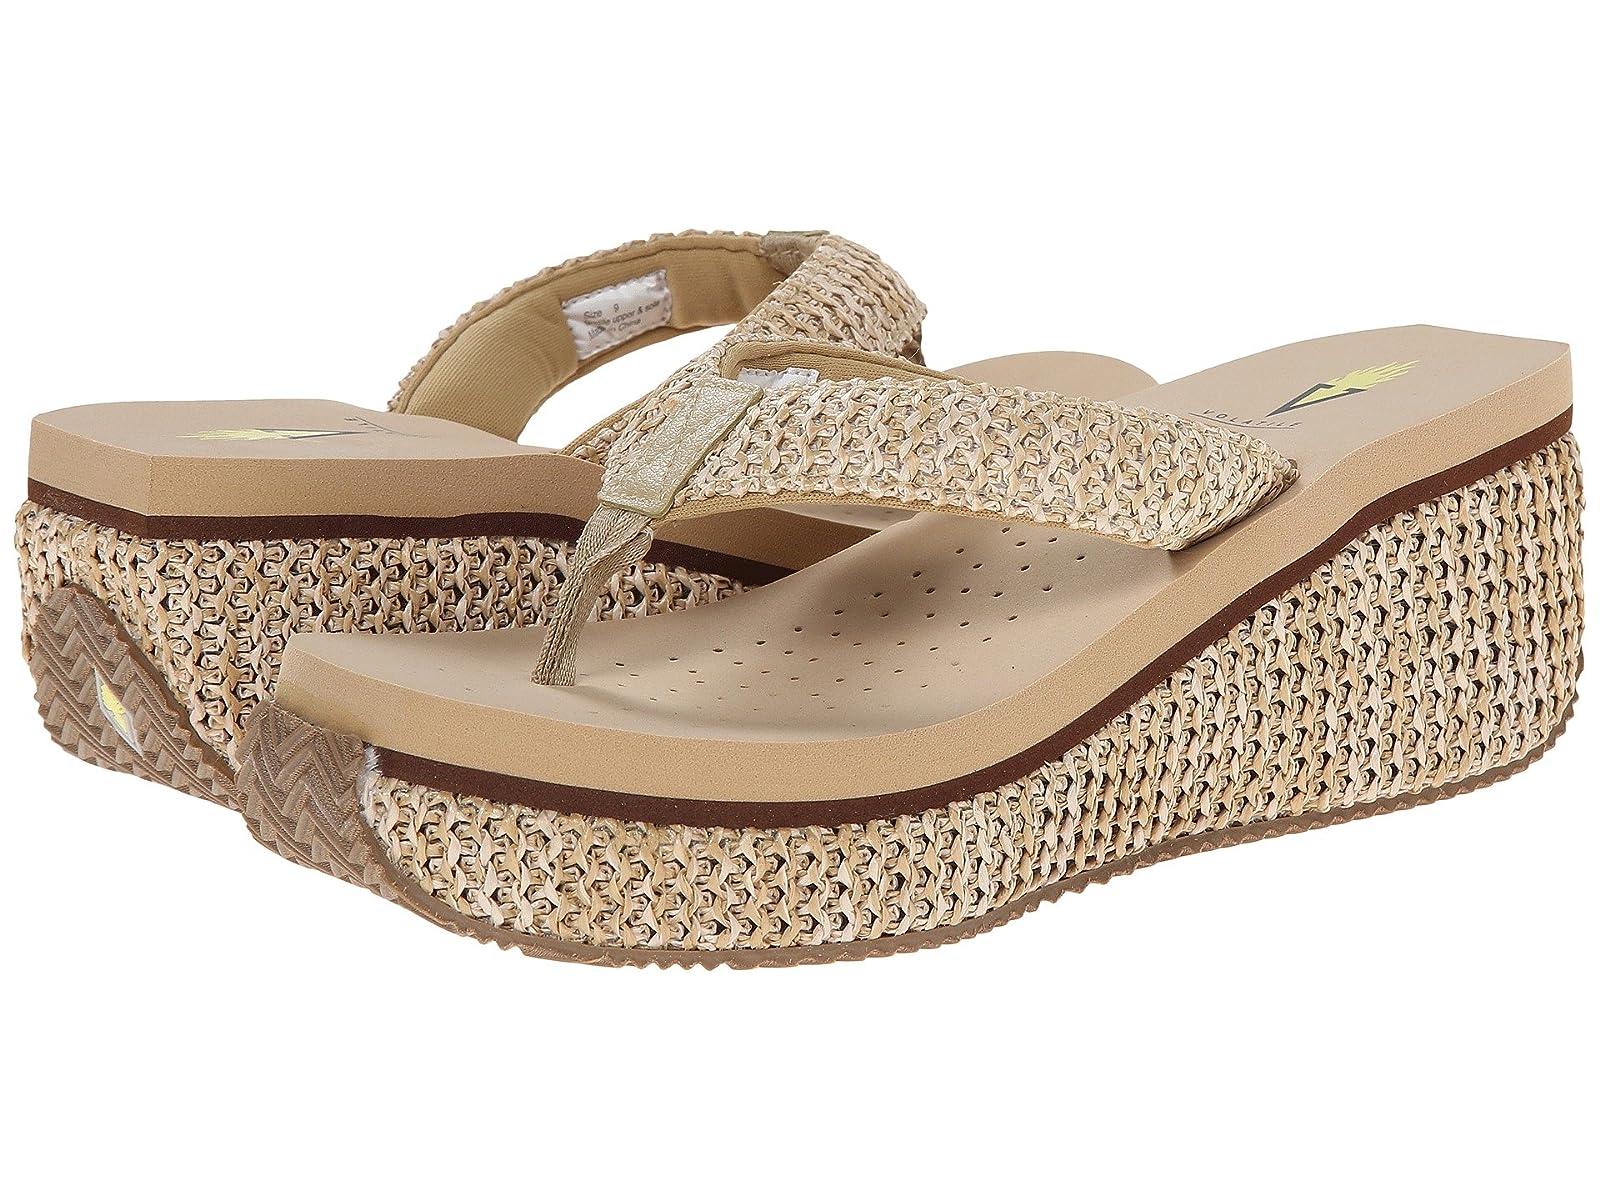 VOLATILE IslandAtmospheric grades have affordable shoes